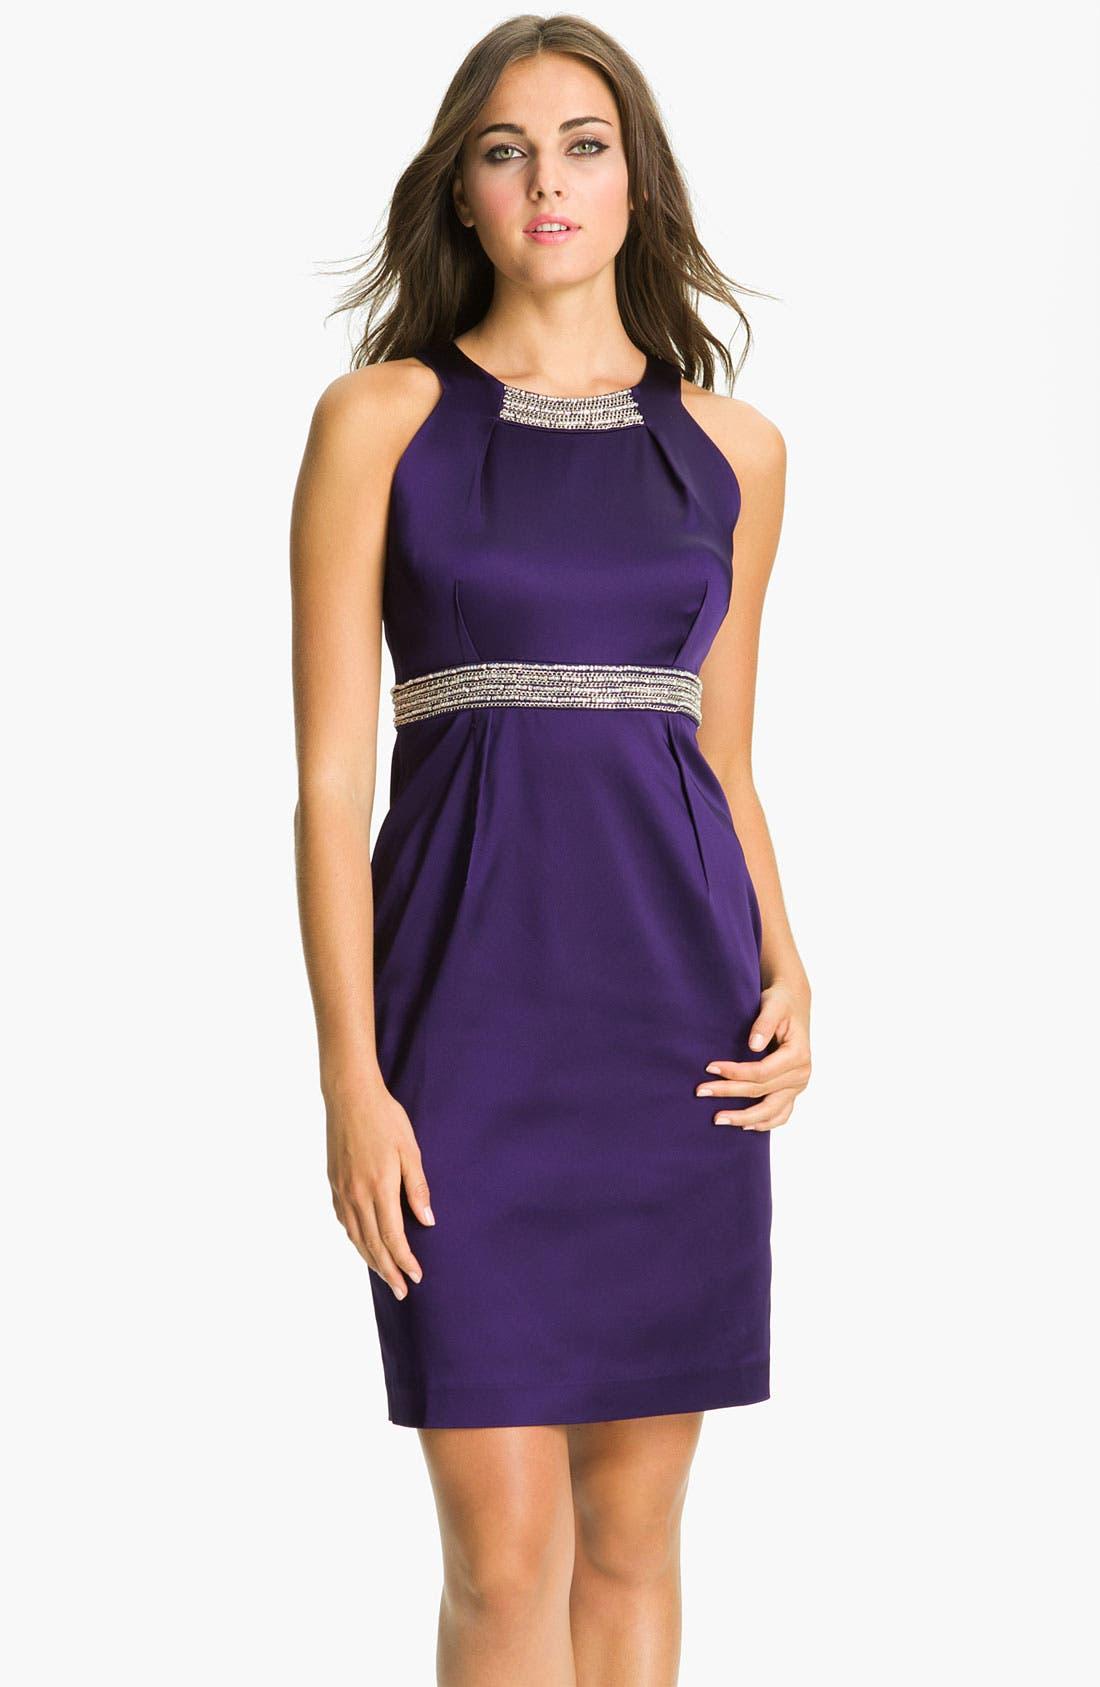 Alternate Image 1 Selected - Calvin Klein Embellished Trim Satin Sheath Dress